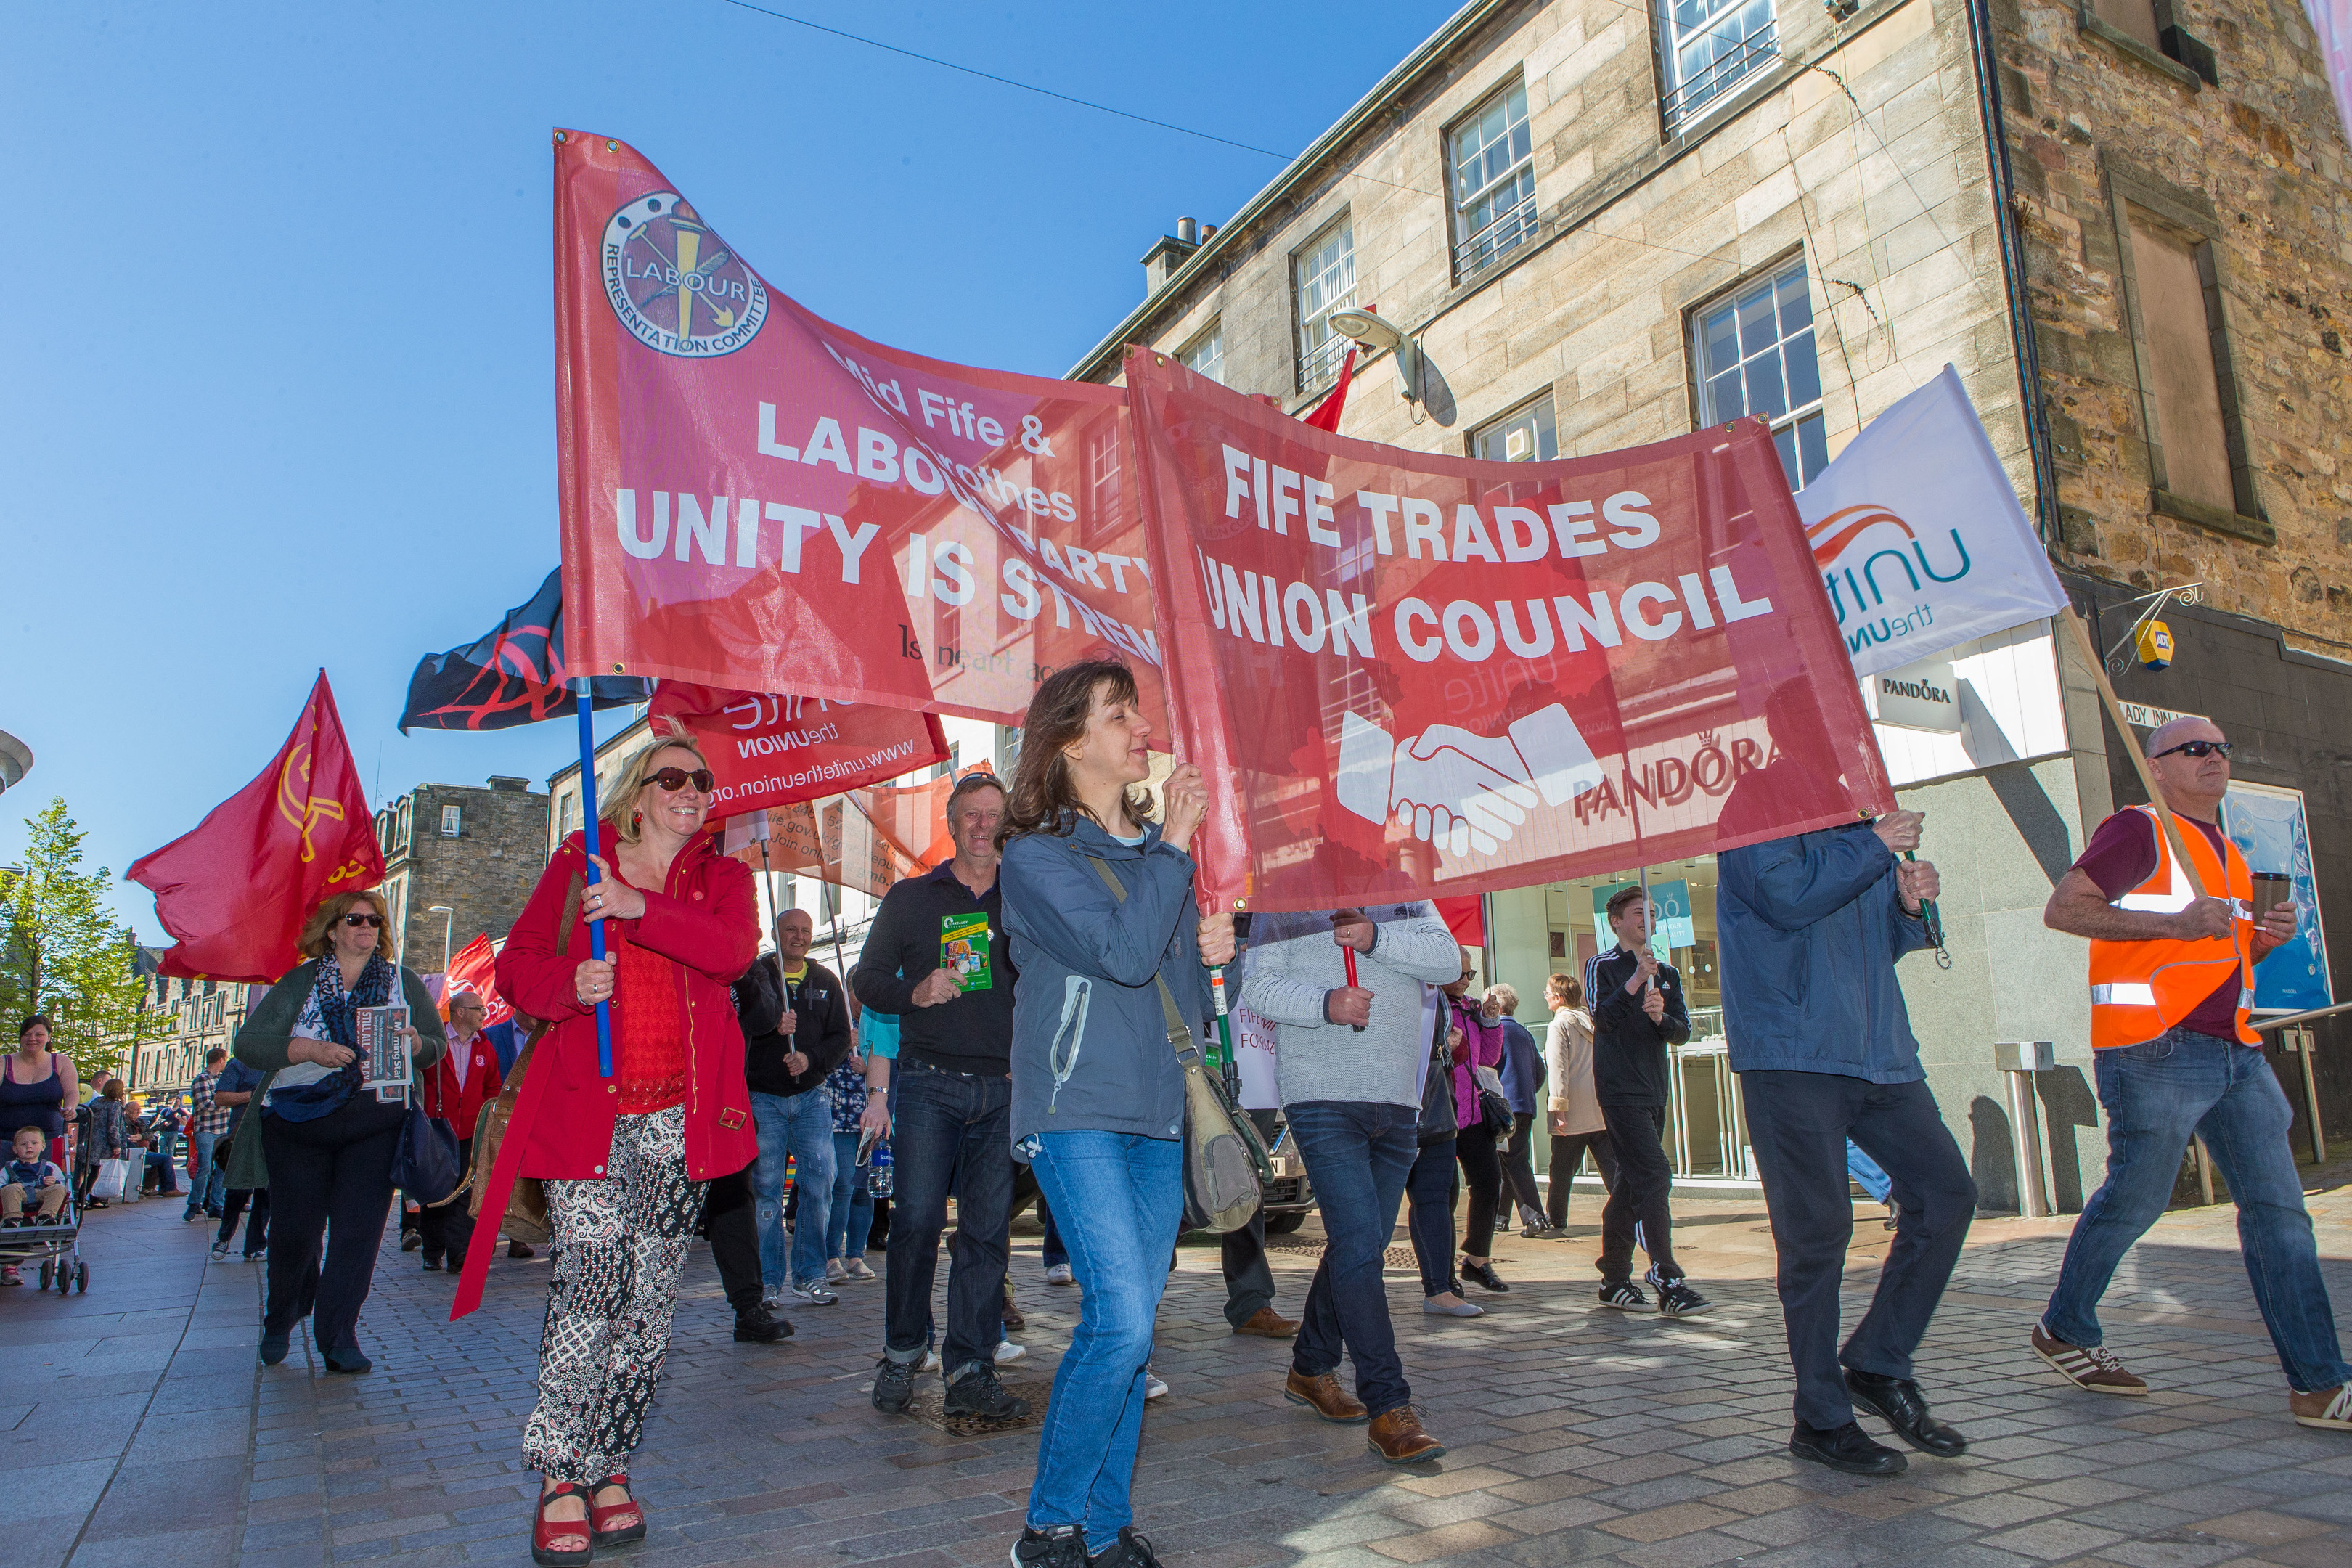 SBro_Trades_Unions_May_Day_March_Kirkcaldy-18 (1)